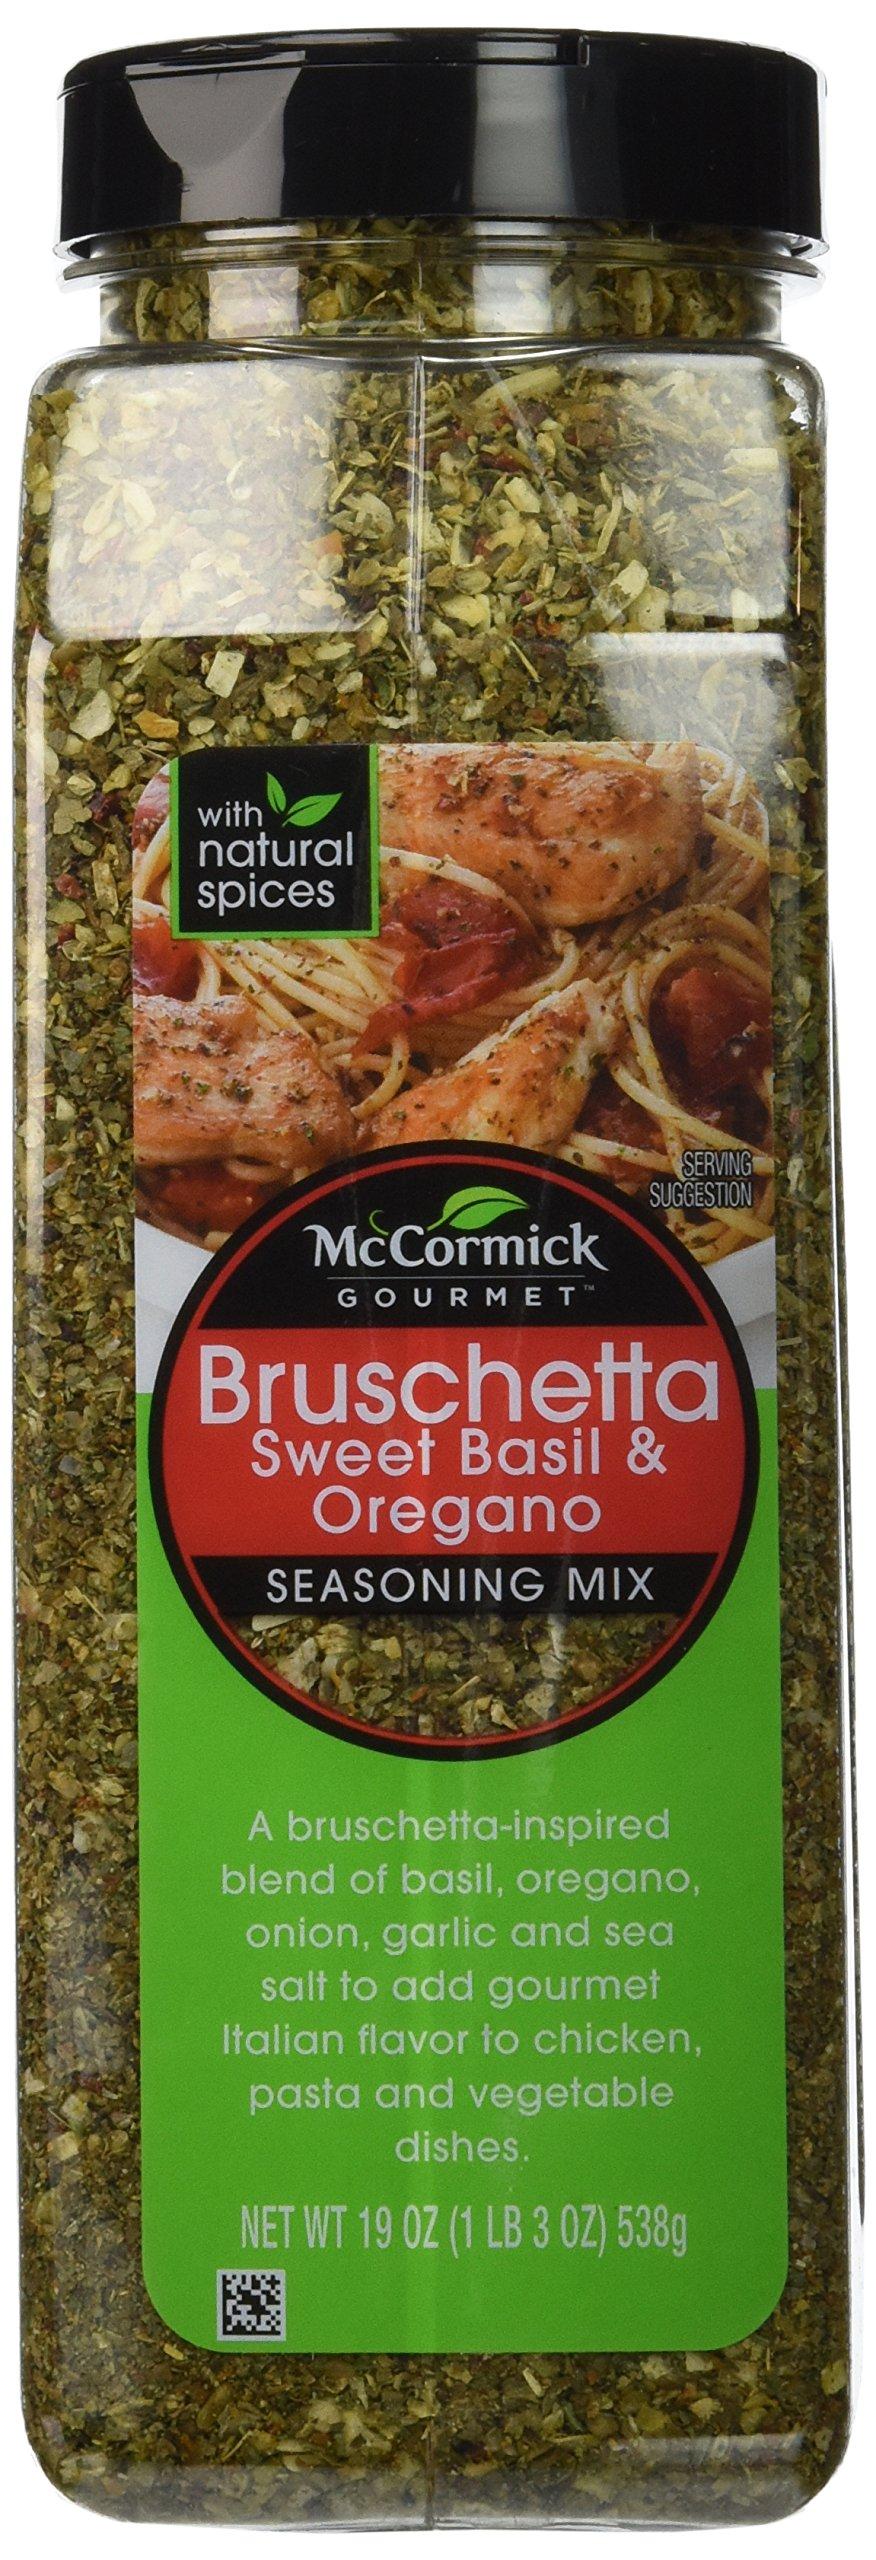 McCormick Gourmet Bruschetta seasoning mix, sweet basil & oregano, 19-oz, plastic shaker